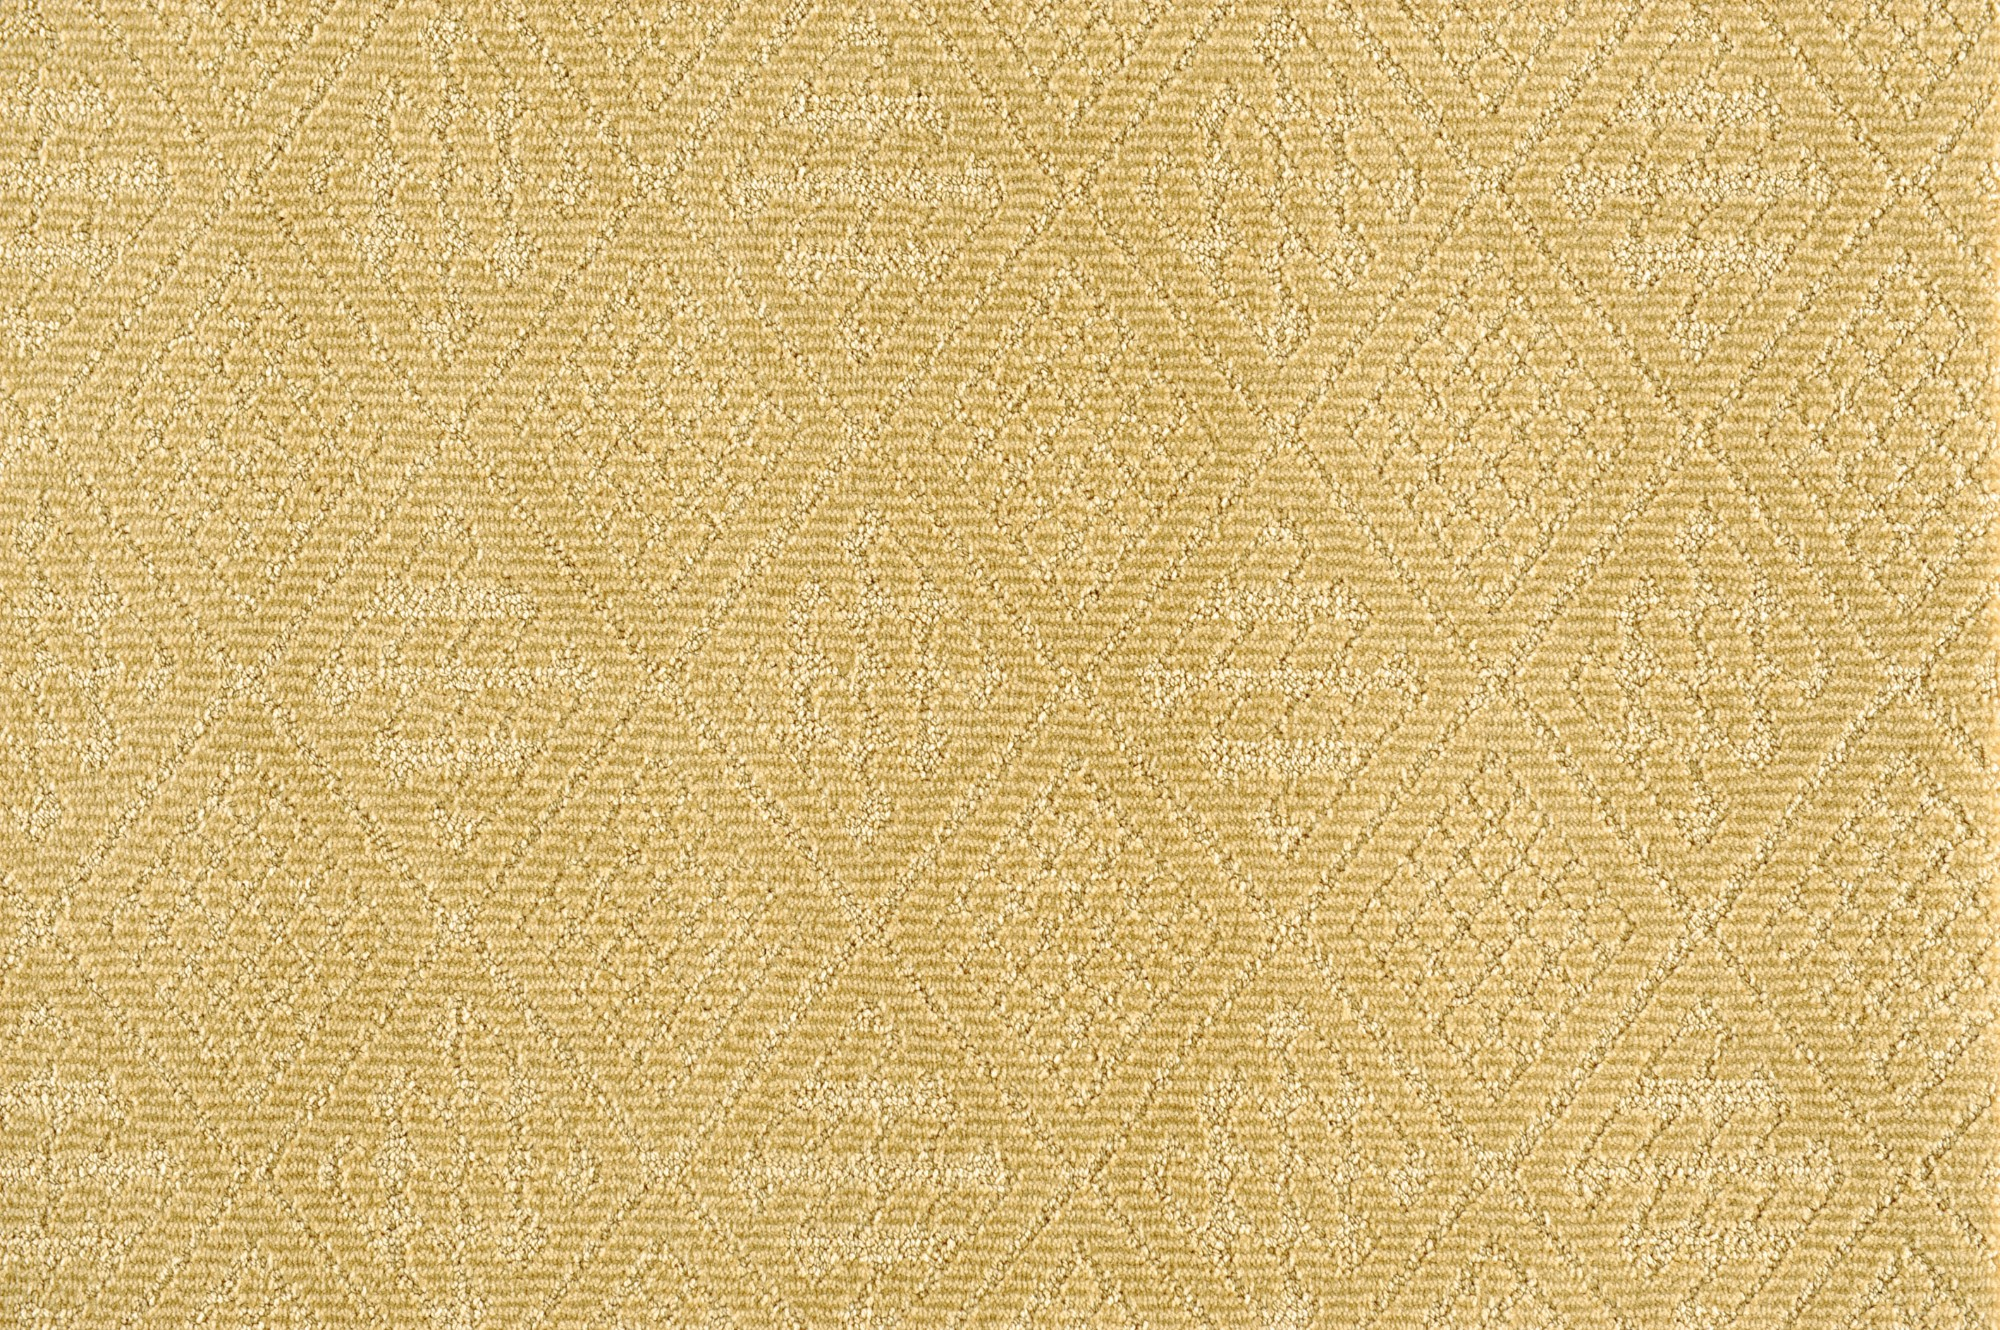 Polypropylene Striped Broadloom Carpet Manufacturers, Polypropylene Striped Broadloom Carpet Factory, Supply Polypropylene Striped Broadloom Carpet